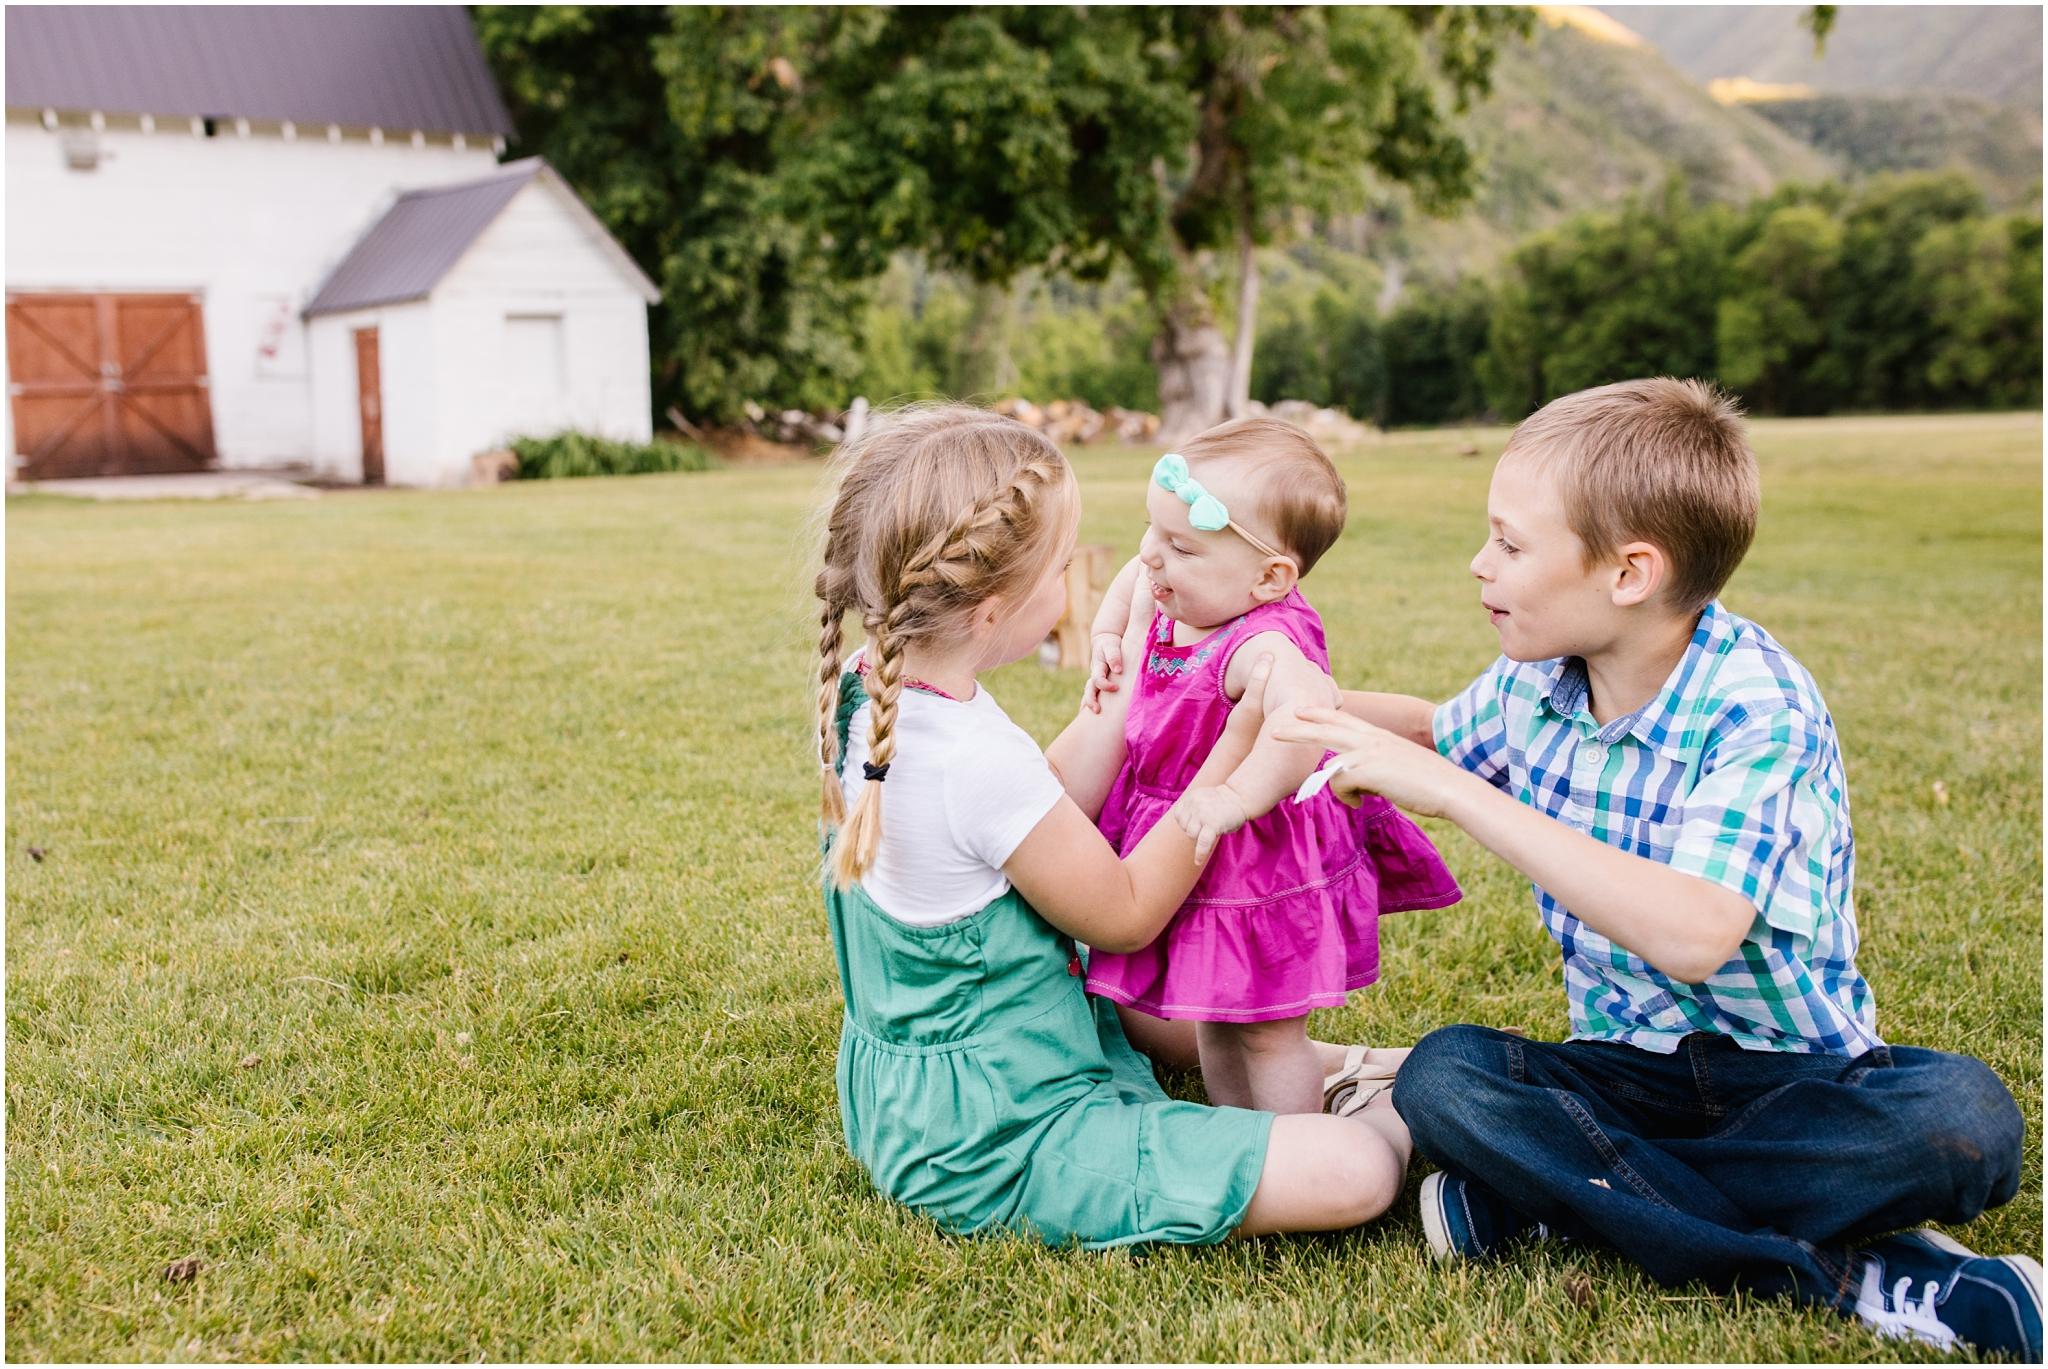 Lizzie-B-Imagery-Utah-Family-Photographer-Utah-County-Photographer-Hobble-Creek-Canyon_0028.jpg